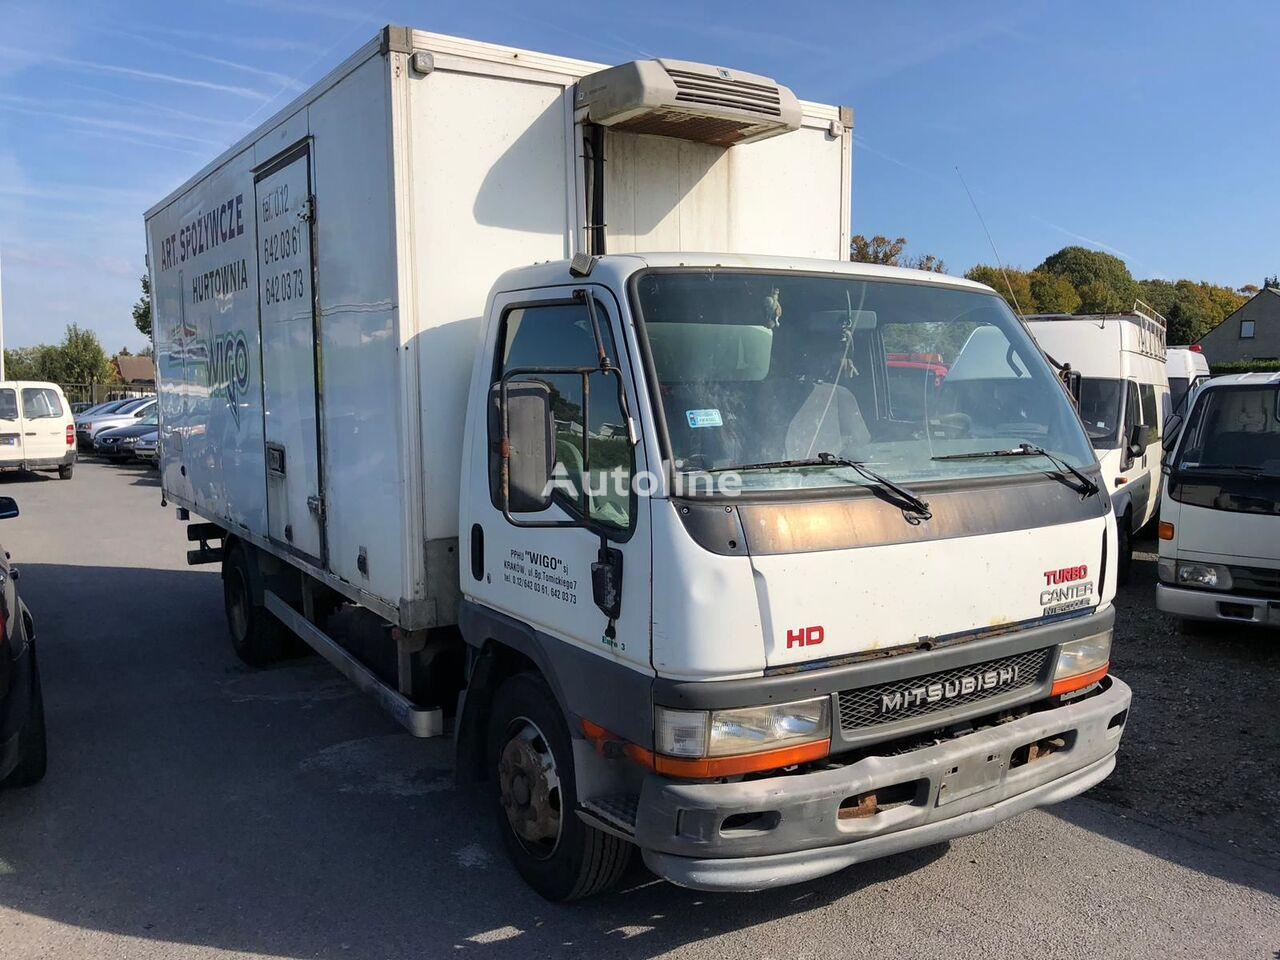 MITSUBISHI canter 3.9 HD koelwagen vrachtwagen